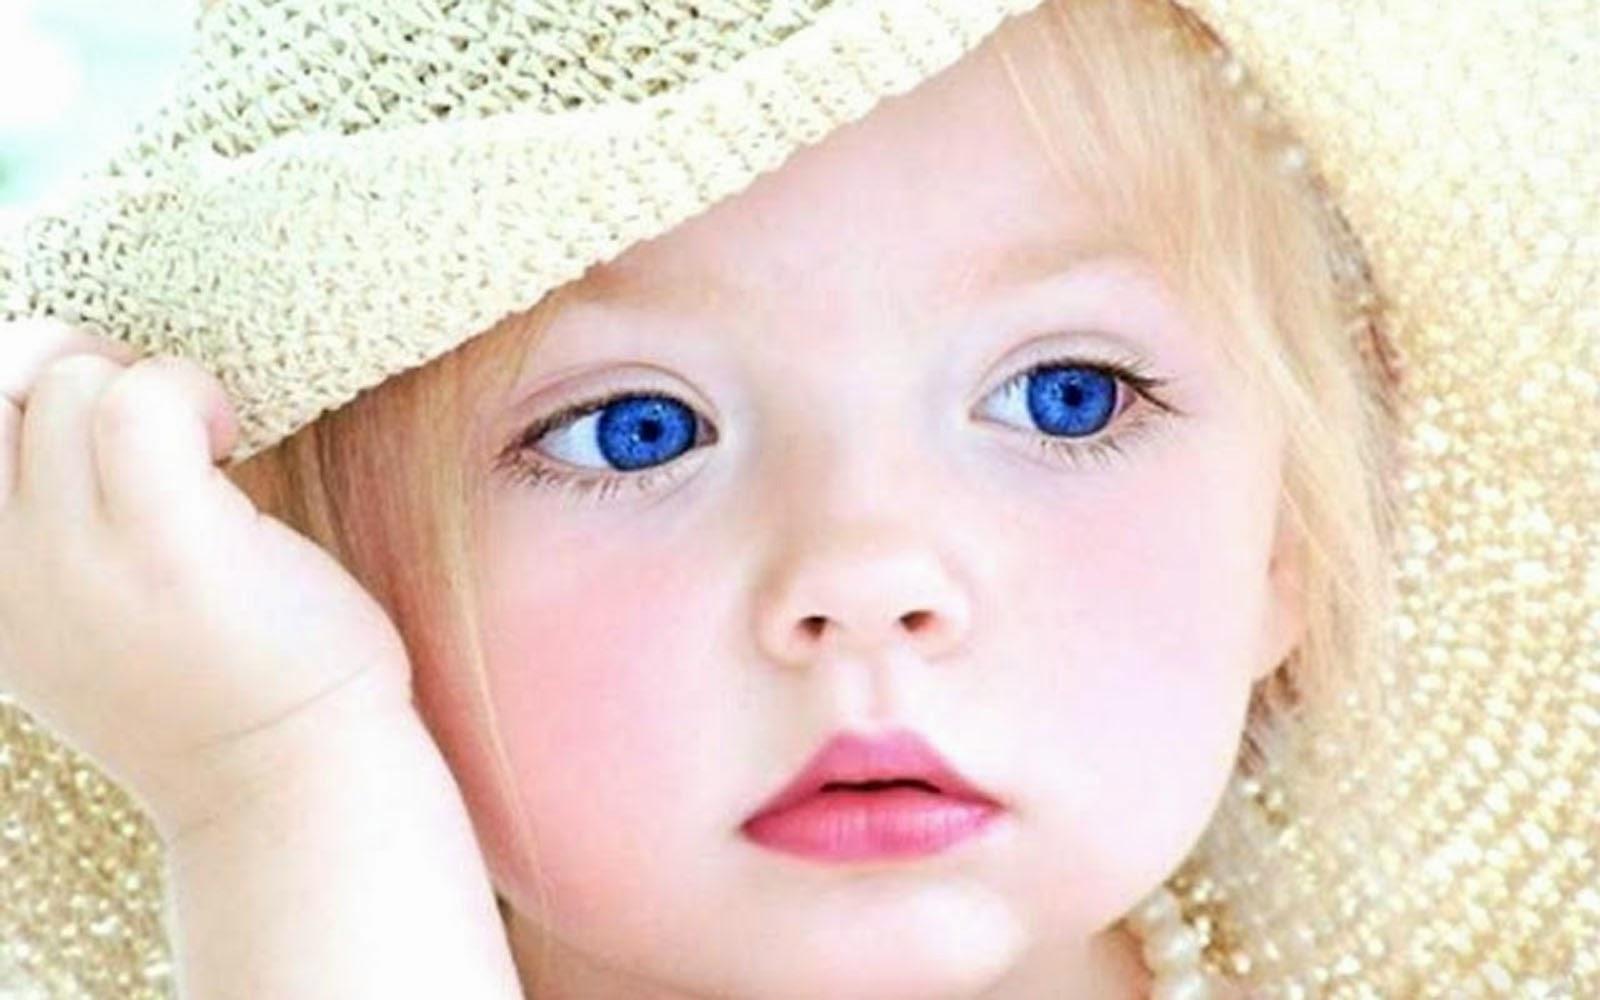 Beautiful Cute Baby Wallpapers: Beautiful Wallpapers For Desktop: HD Cute Baby Wallpapers